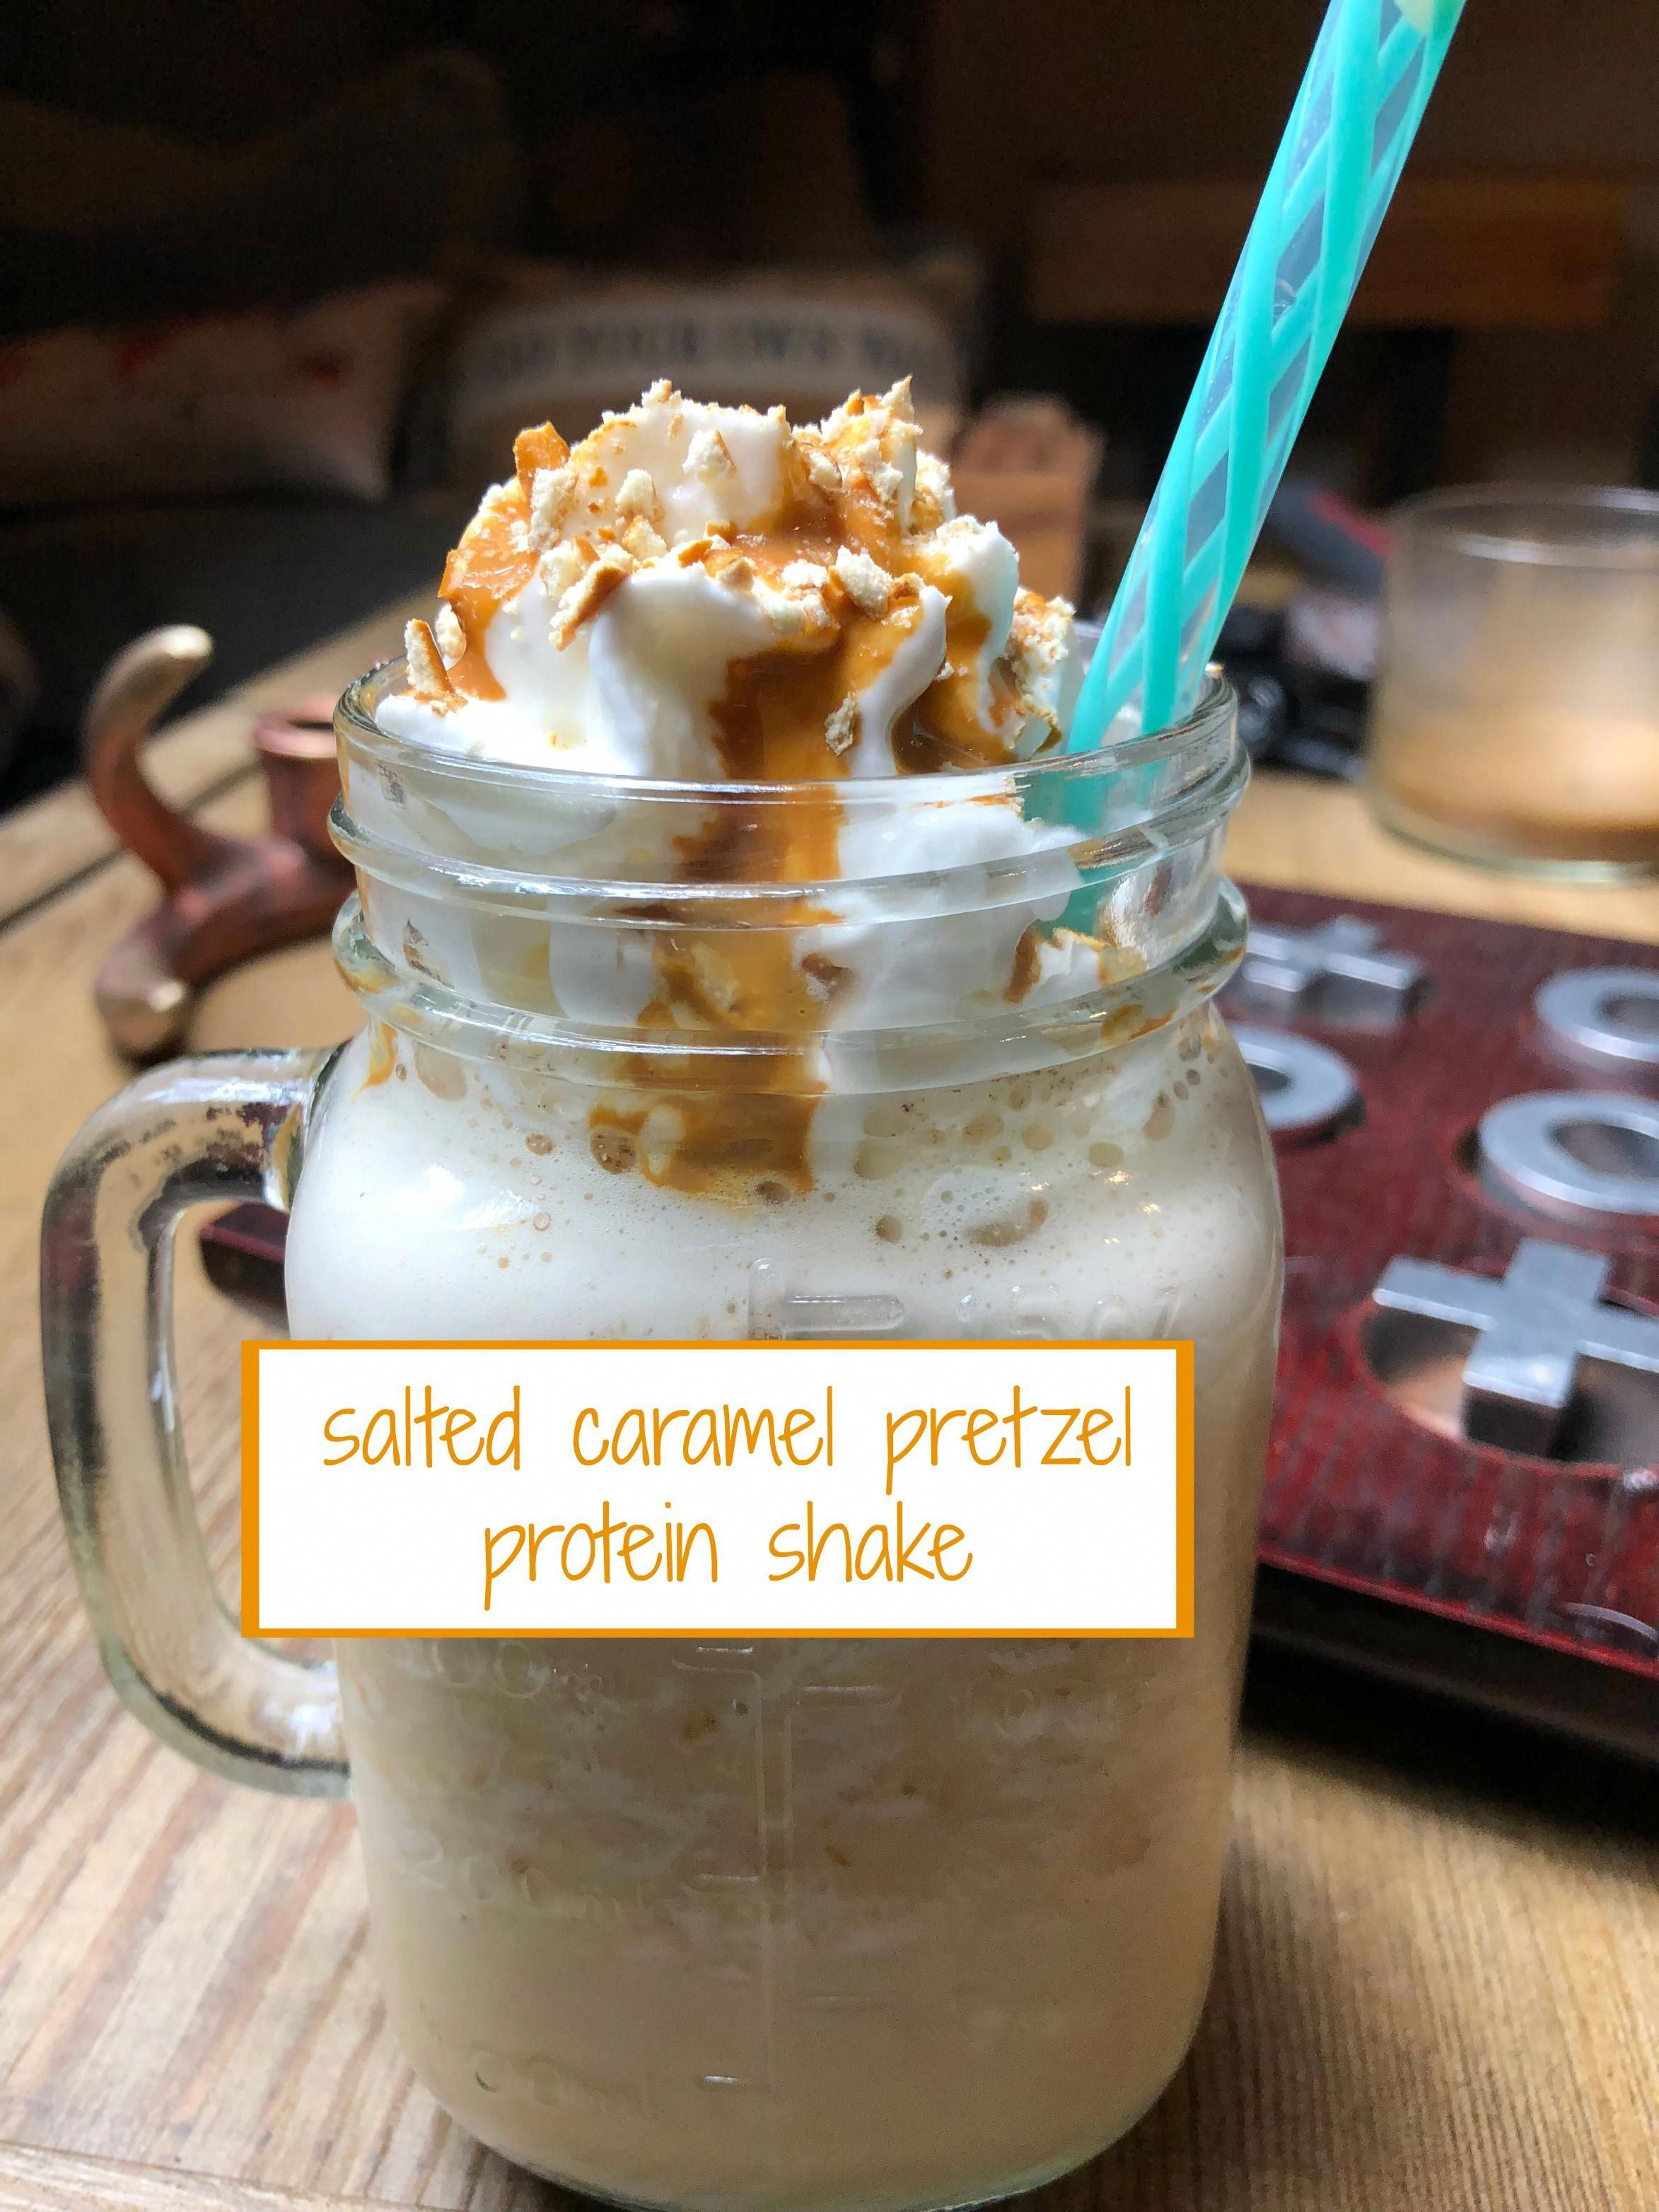 Tastykake Kandy Bar Almond Joy Coconut Almond Creme Filled